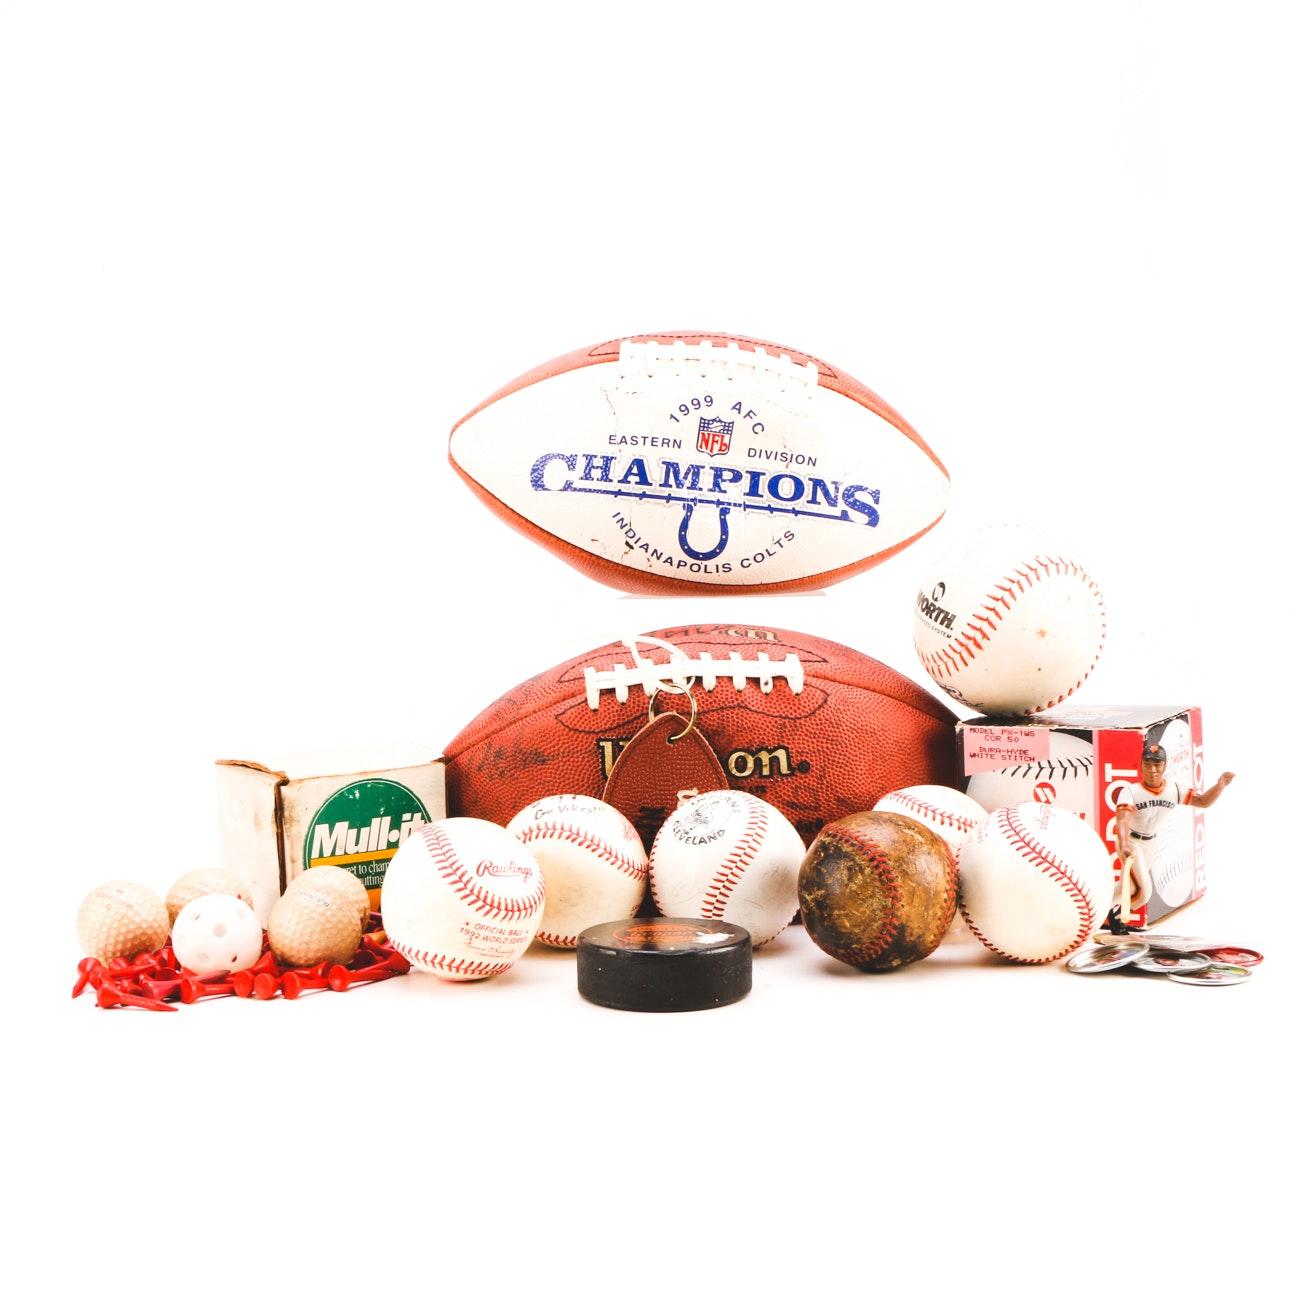 Assorted Baseball, Football, Golf, and Hockey Collectibles